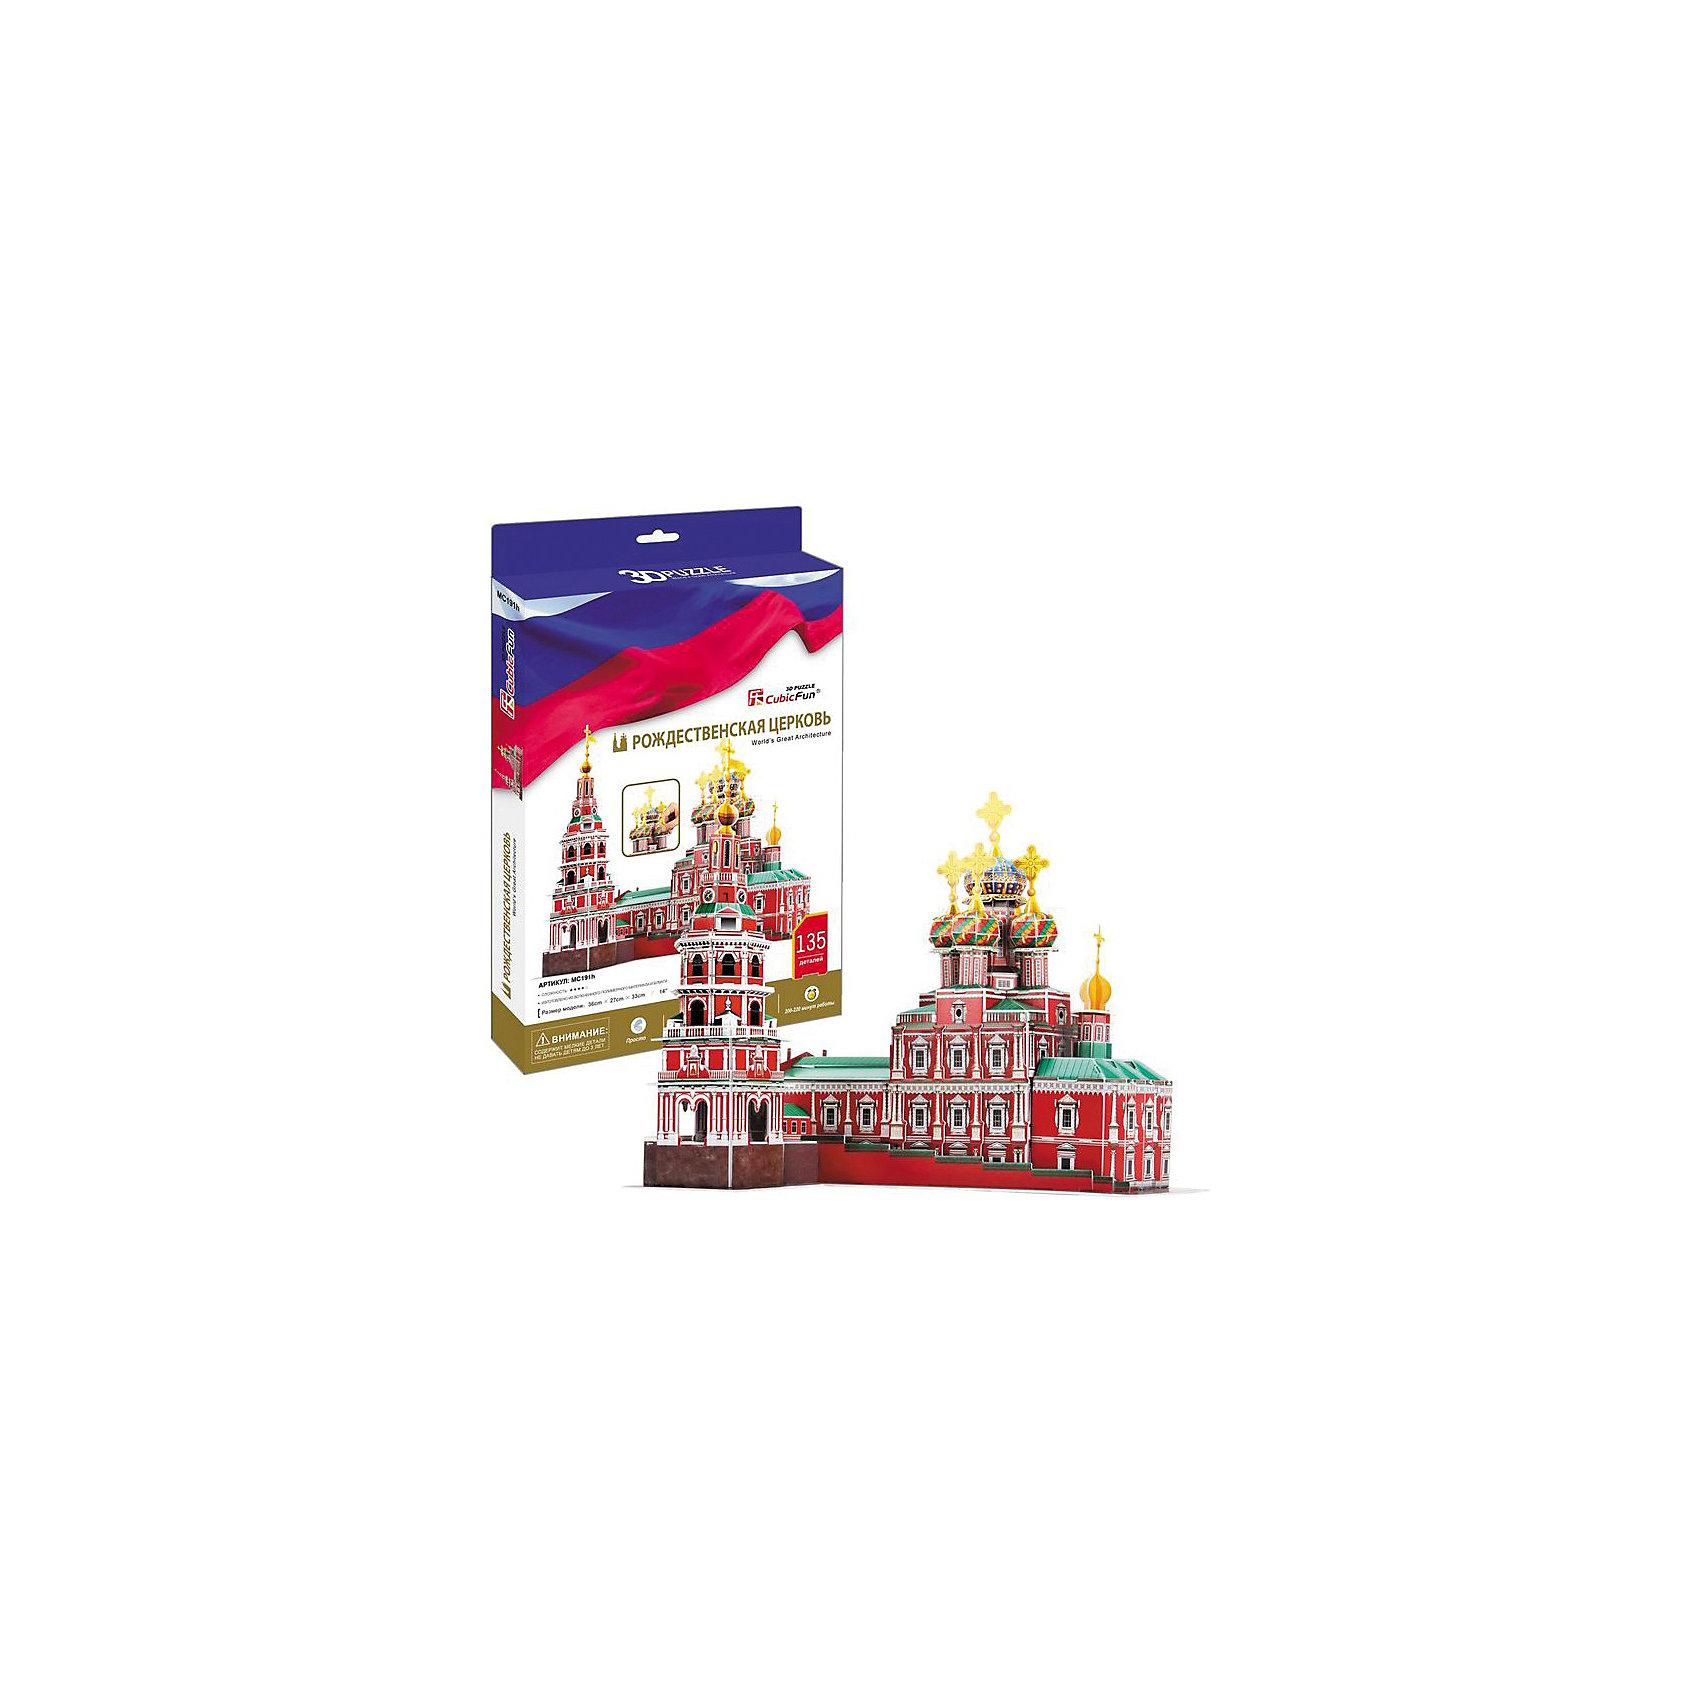 CubicFun Пазл 3D Рождественская церковь (Россия), CubicFun cubicfun 3d пазл эйфелева башня 2 франция cubicfun 33 детали